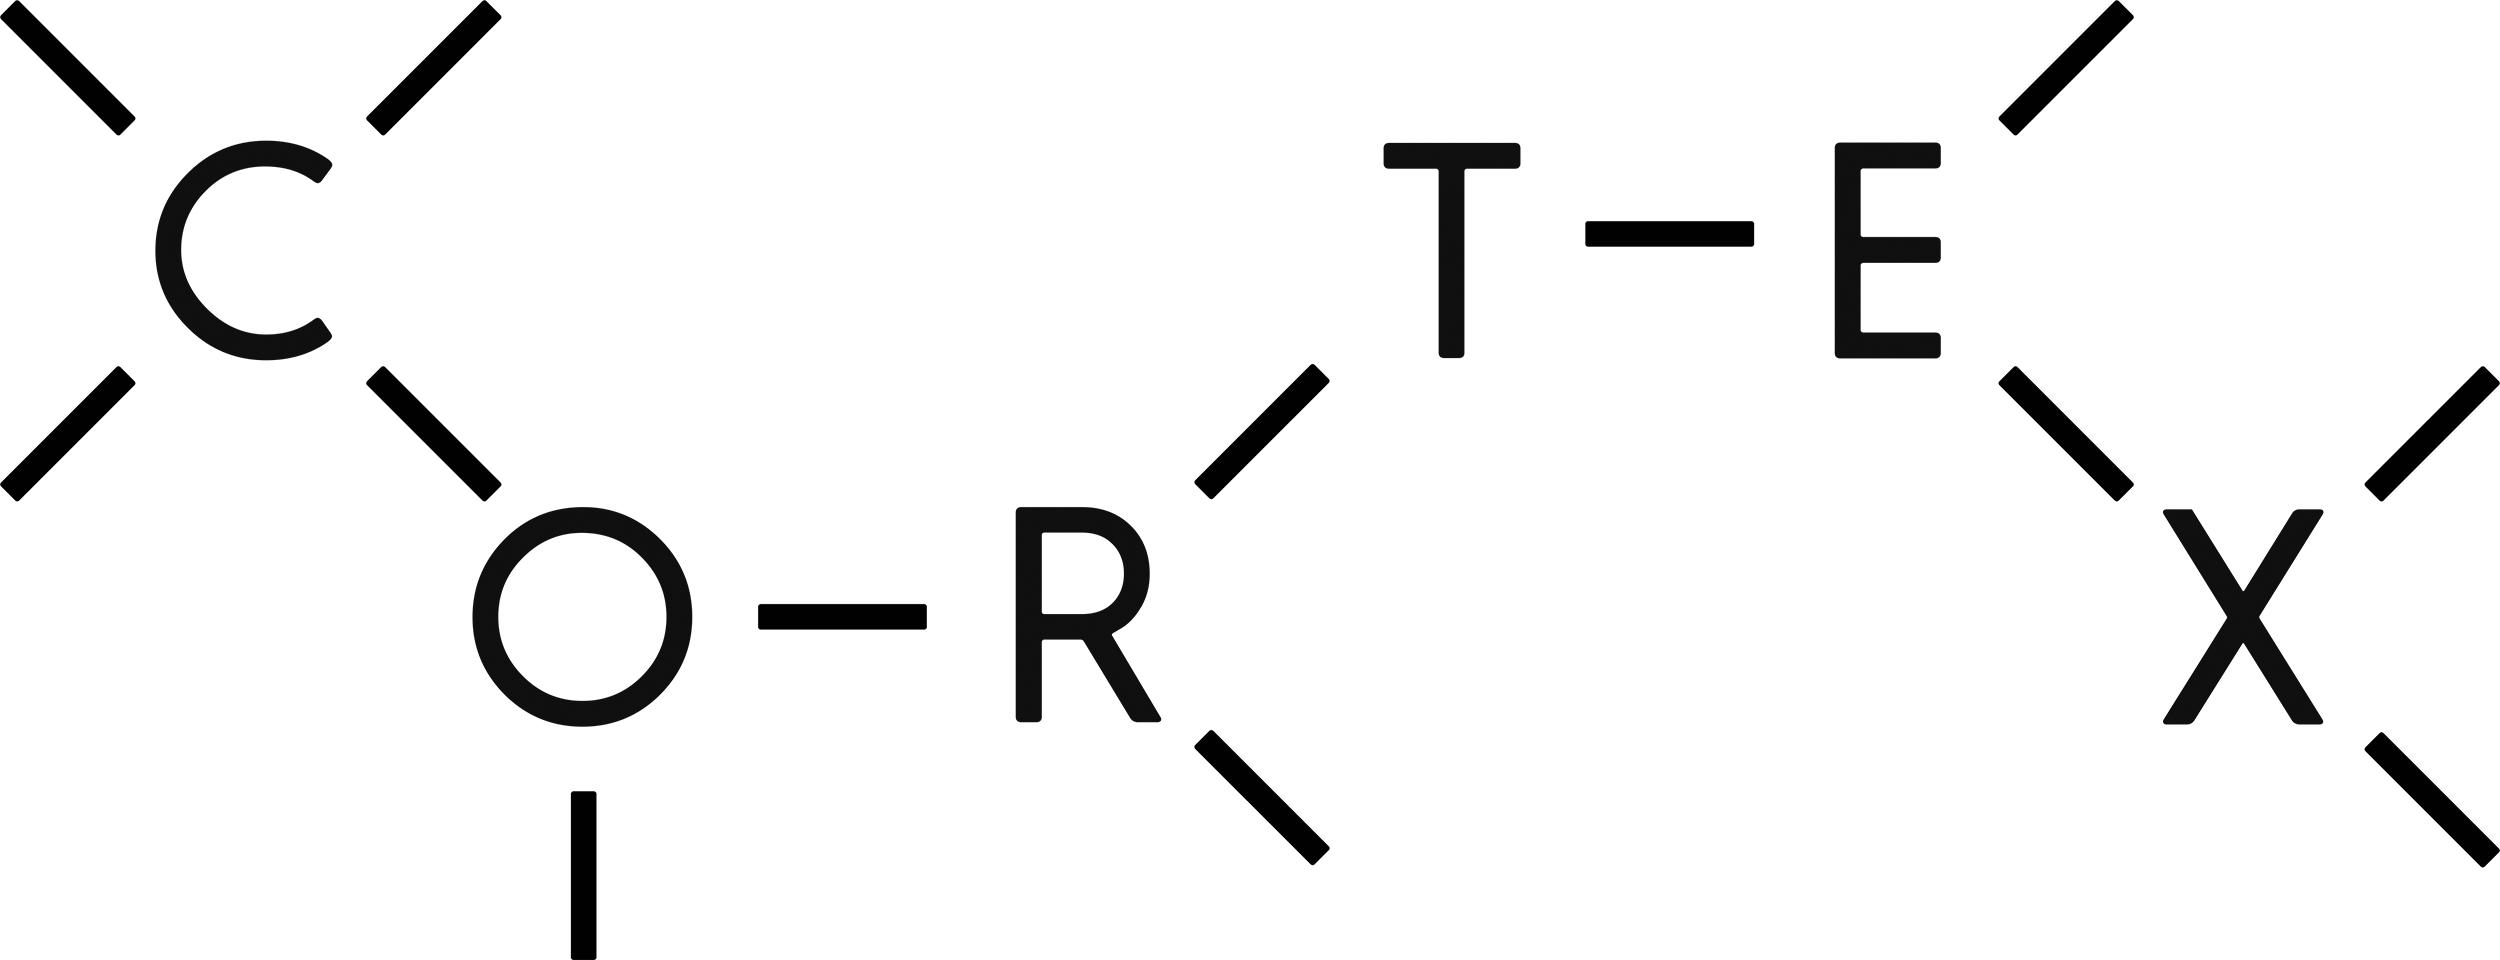 cortext-1